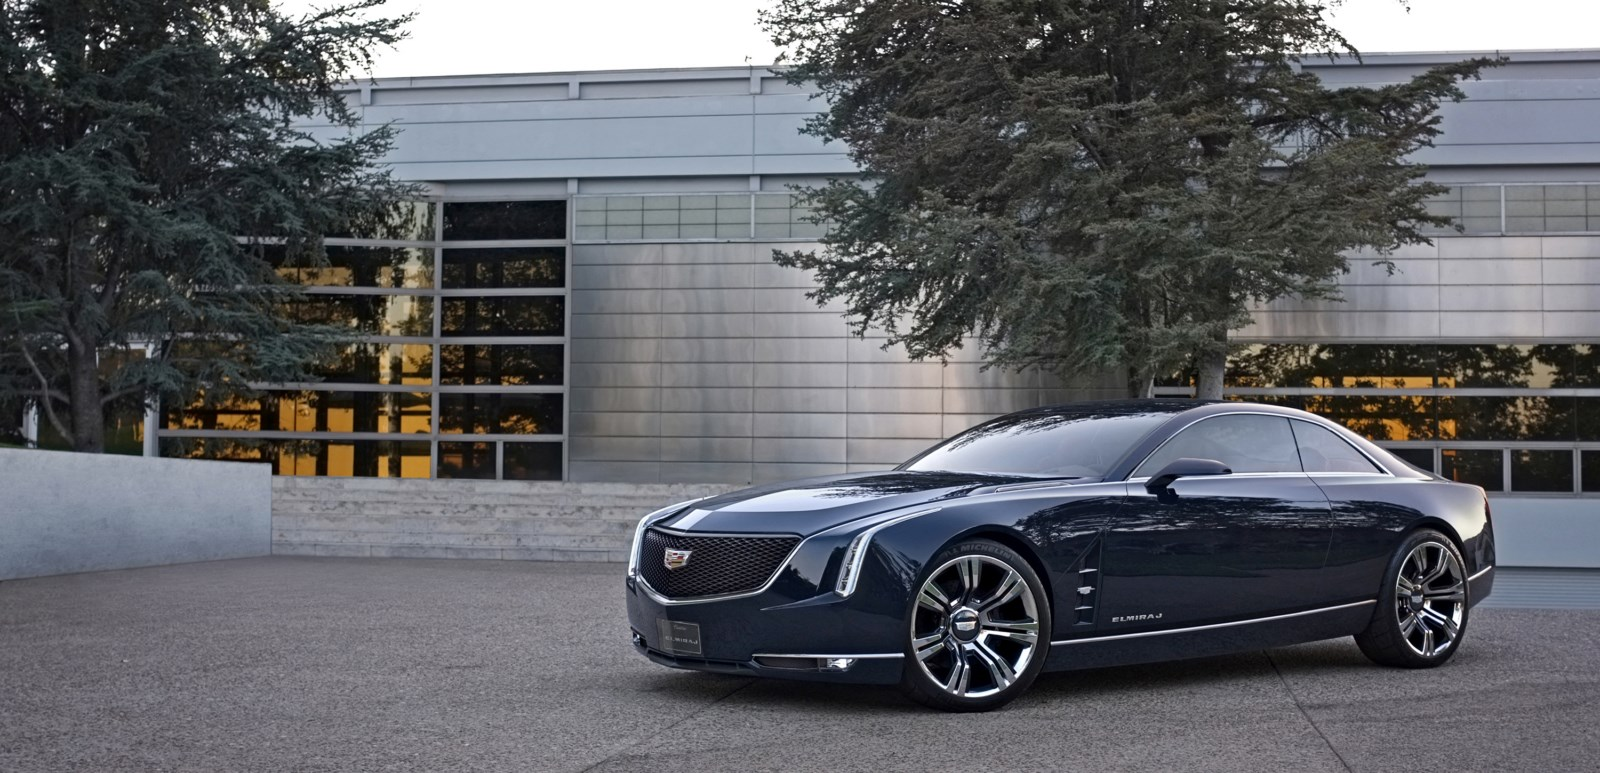 2021 Cadillac Elmiraj Rumors